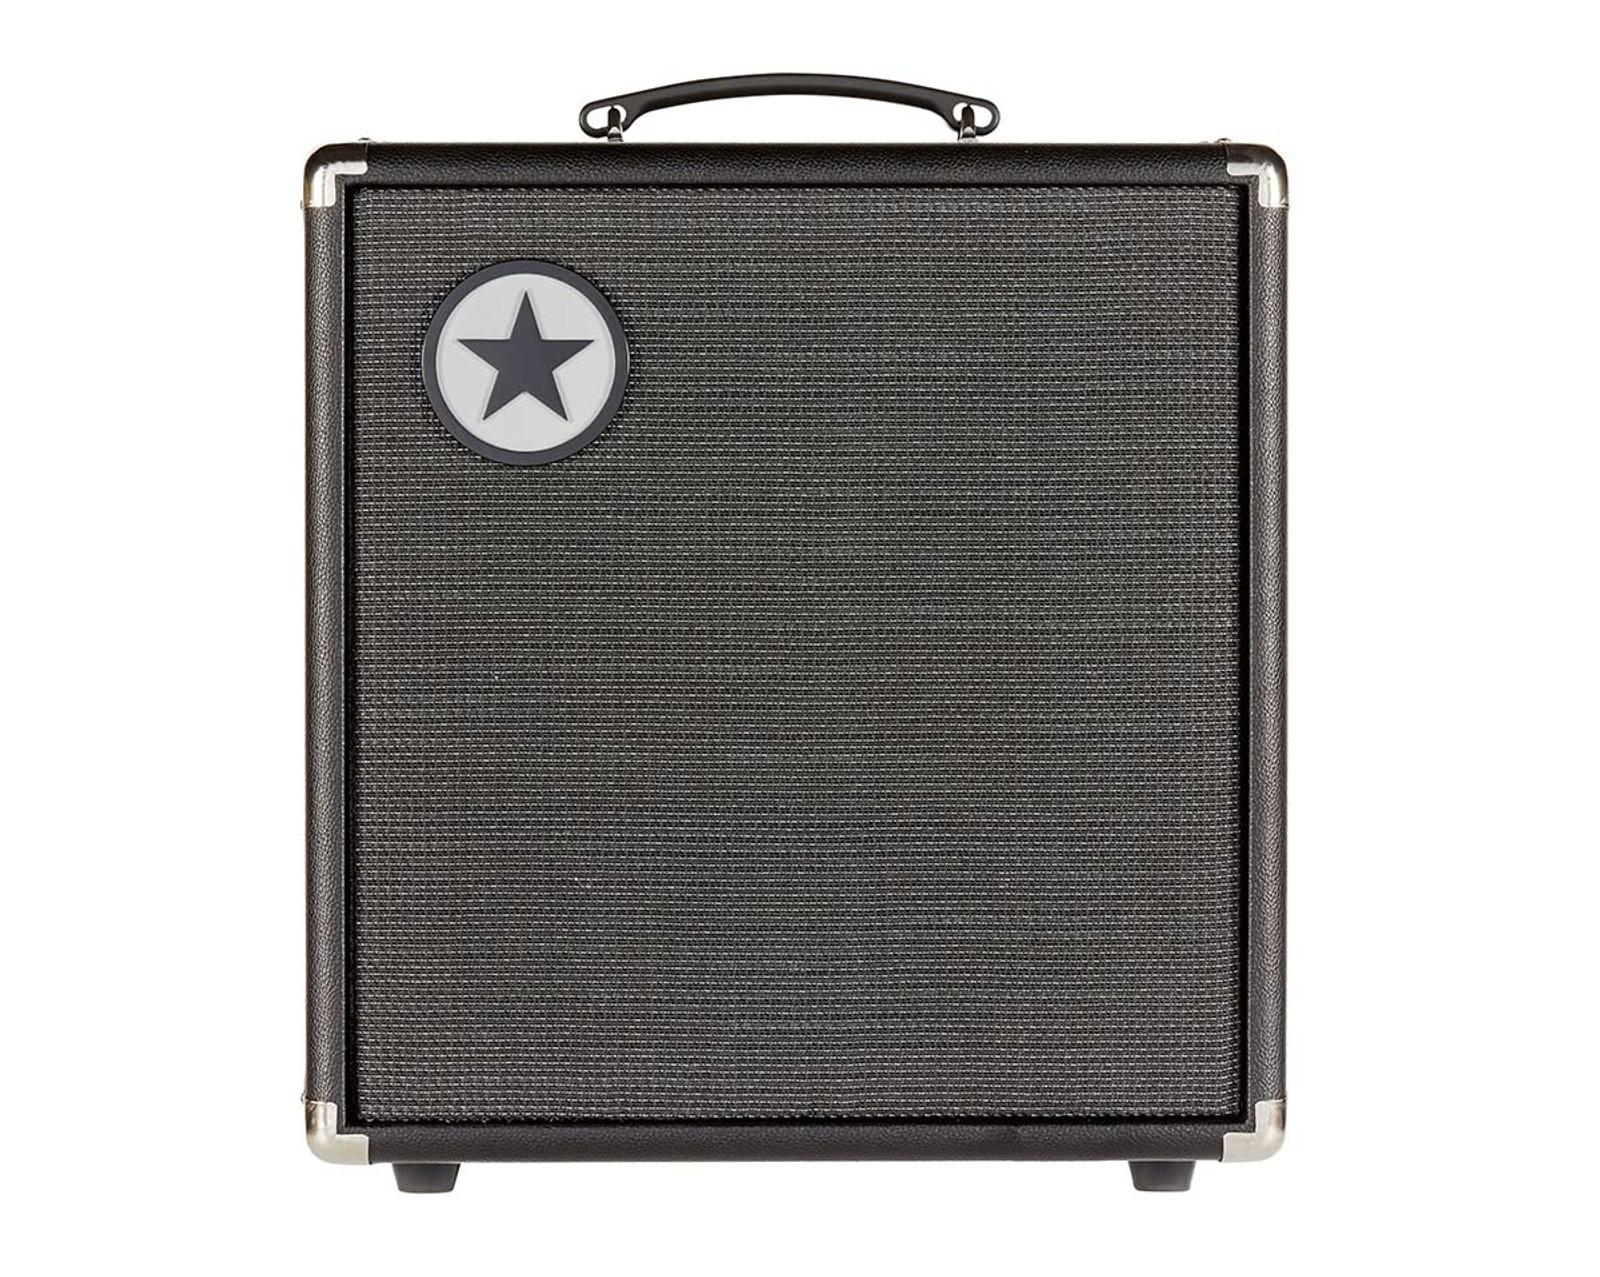 Blackstar UNITY 60 Watt Combo Bass Amp